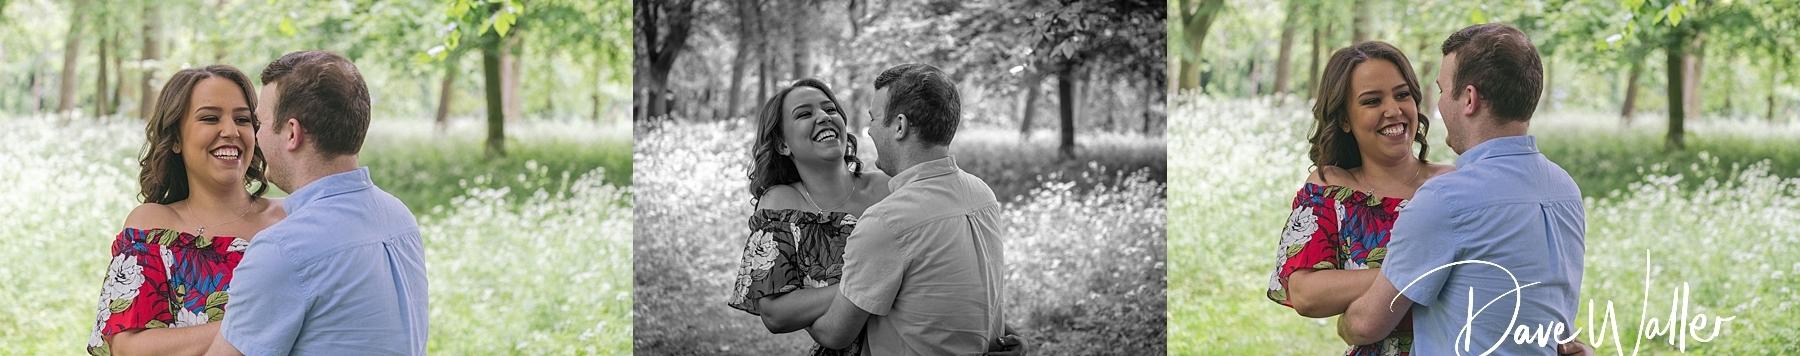 00012_WEST_YORKSHIRE_WEDDING_PHOTOGRAPHER_LEEDS_WEDDING_PHOTOGRAPHER_.jpg